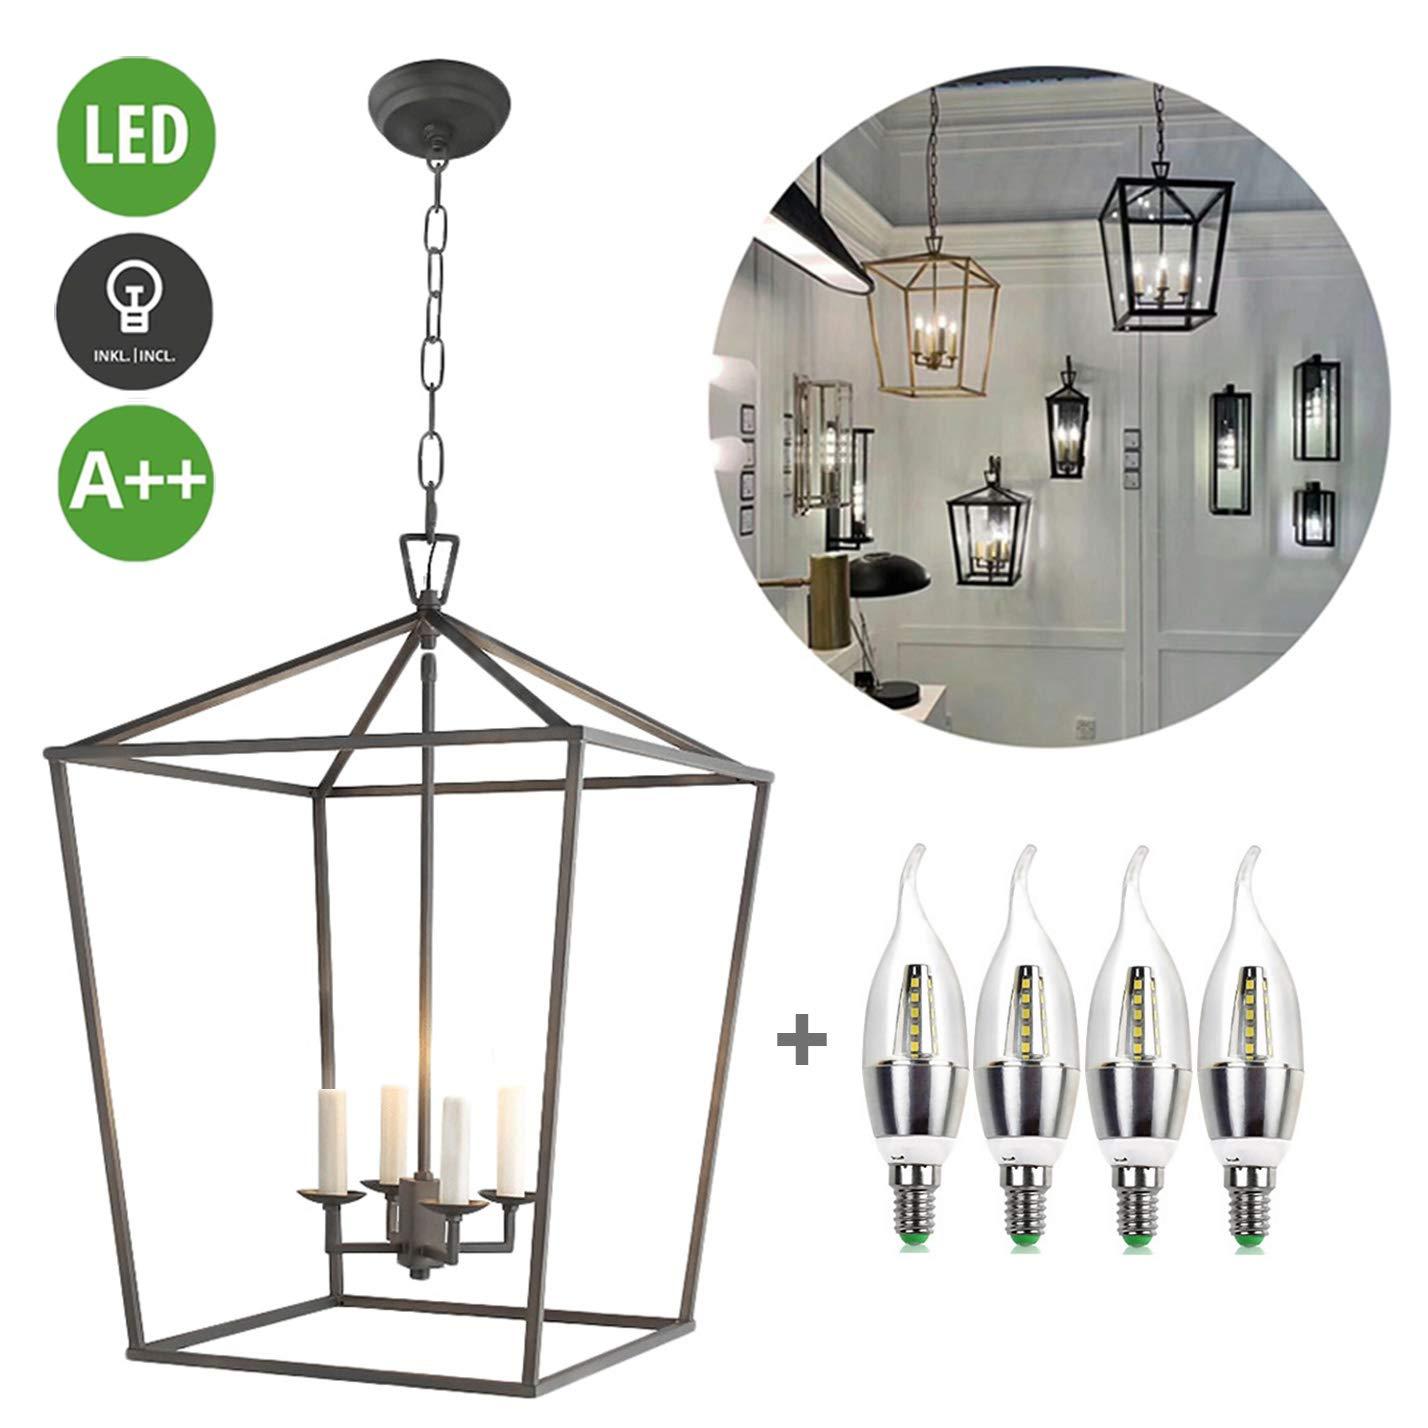 Bulbs not Included max 40W E27 Socket Restaurant Vintage Ceiling Light for Dining Room Total Height 1.1m B.K.Licht 3-Light Industrial Pendant Lamp Black Metal Retro Chandelier IP20 Kitchen